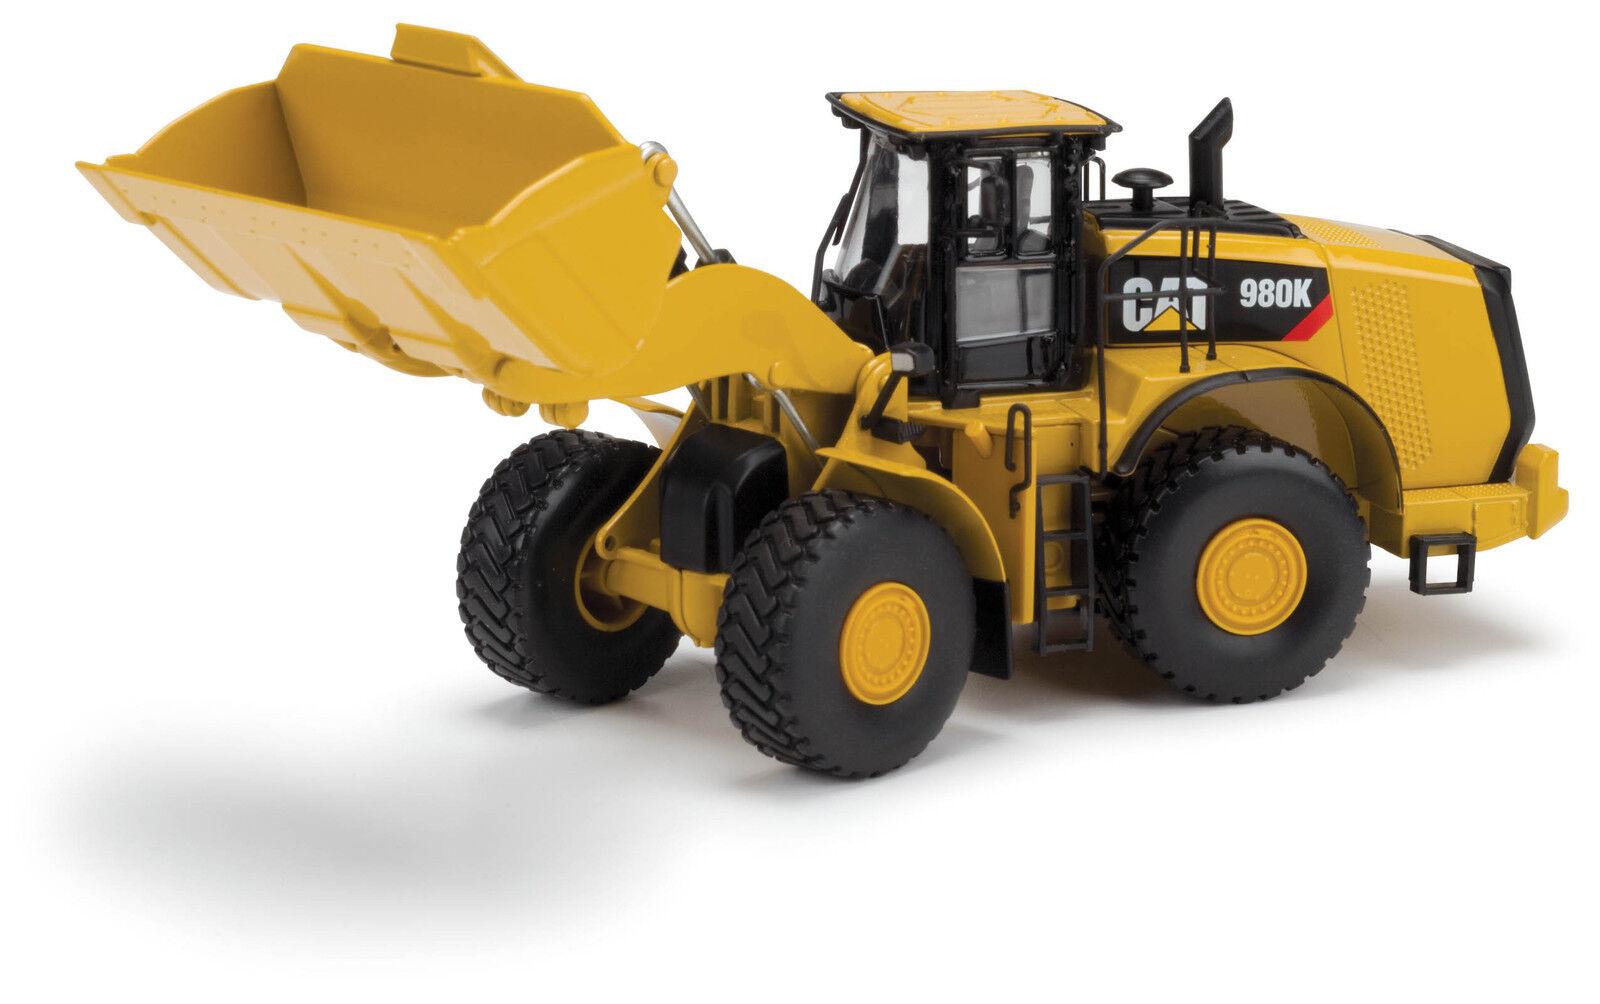 Caterpillar 1 50 scale Cat 980K Material Handling Wheel Loader Norscot 55289